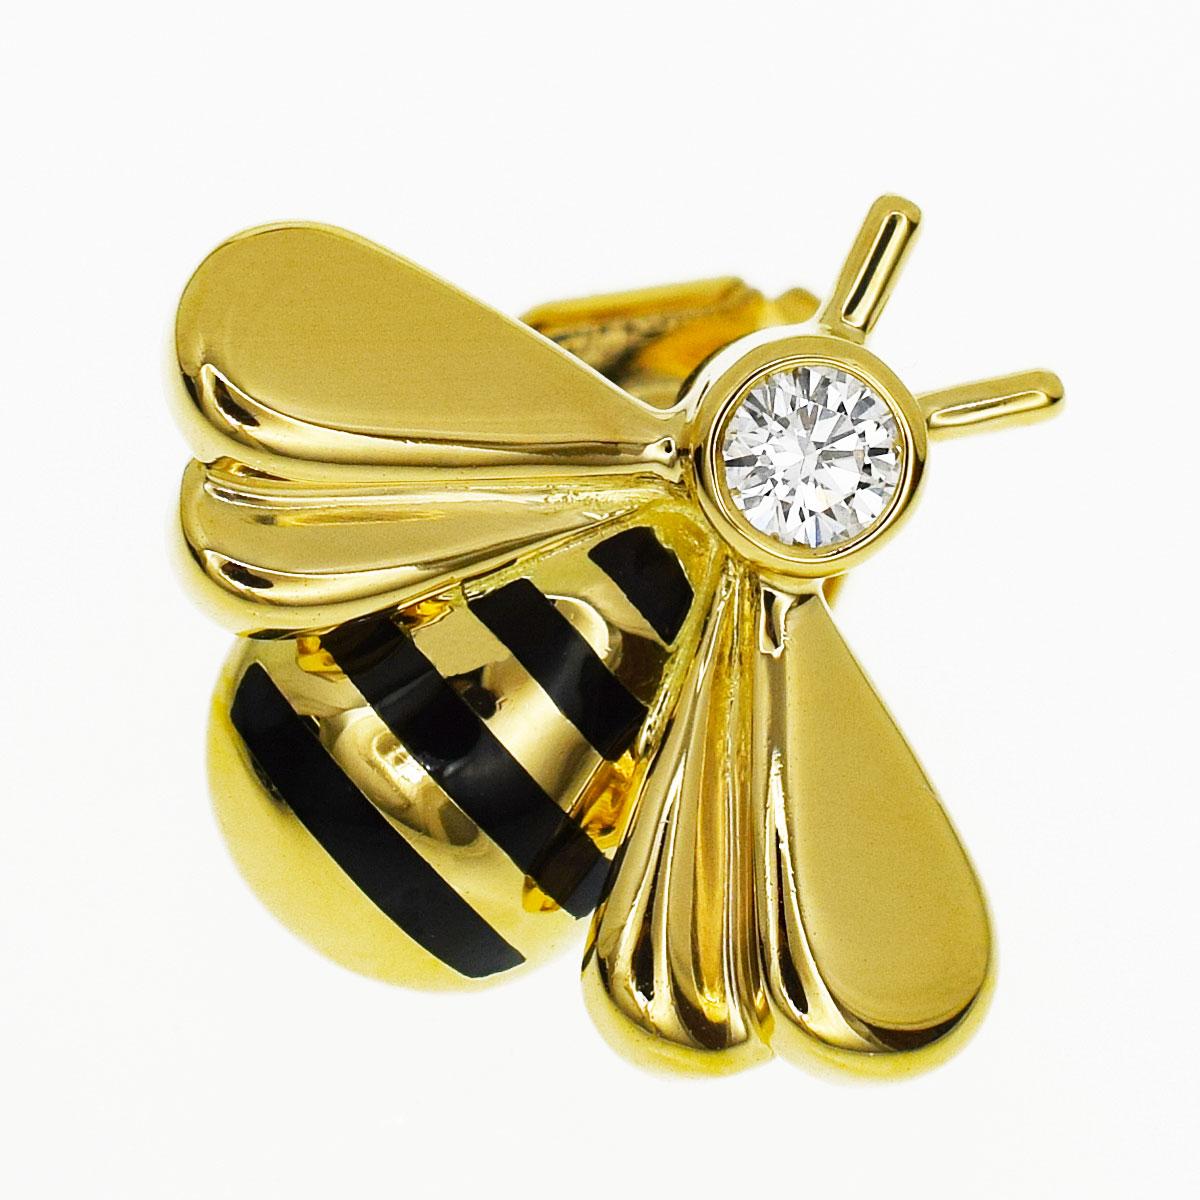 Cartier カルティエ ダイヤ ビー ピンブローチ 750 K18 YG イエローゴールド 1990【送料無料】ハチ 蜂【中古】【代引き手数料無料】31280426